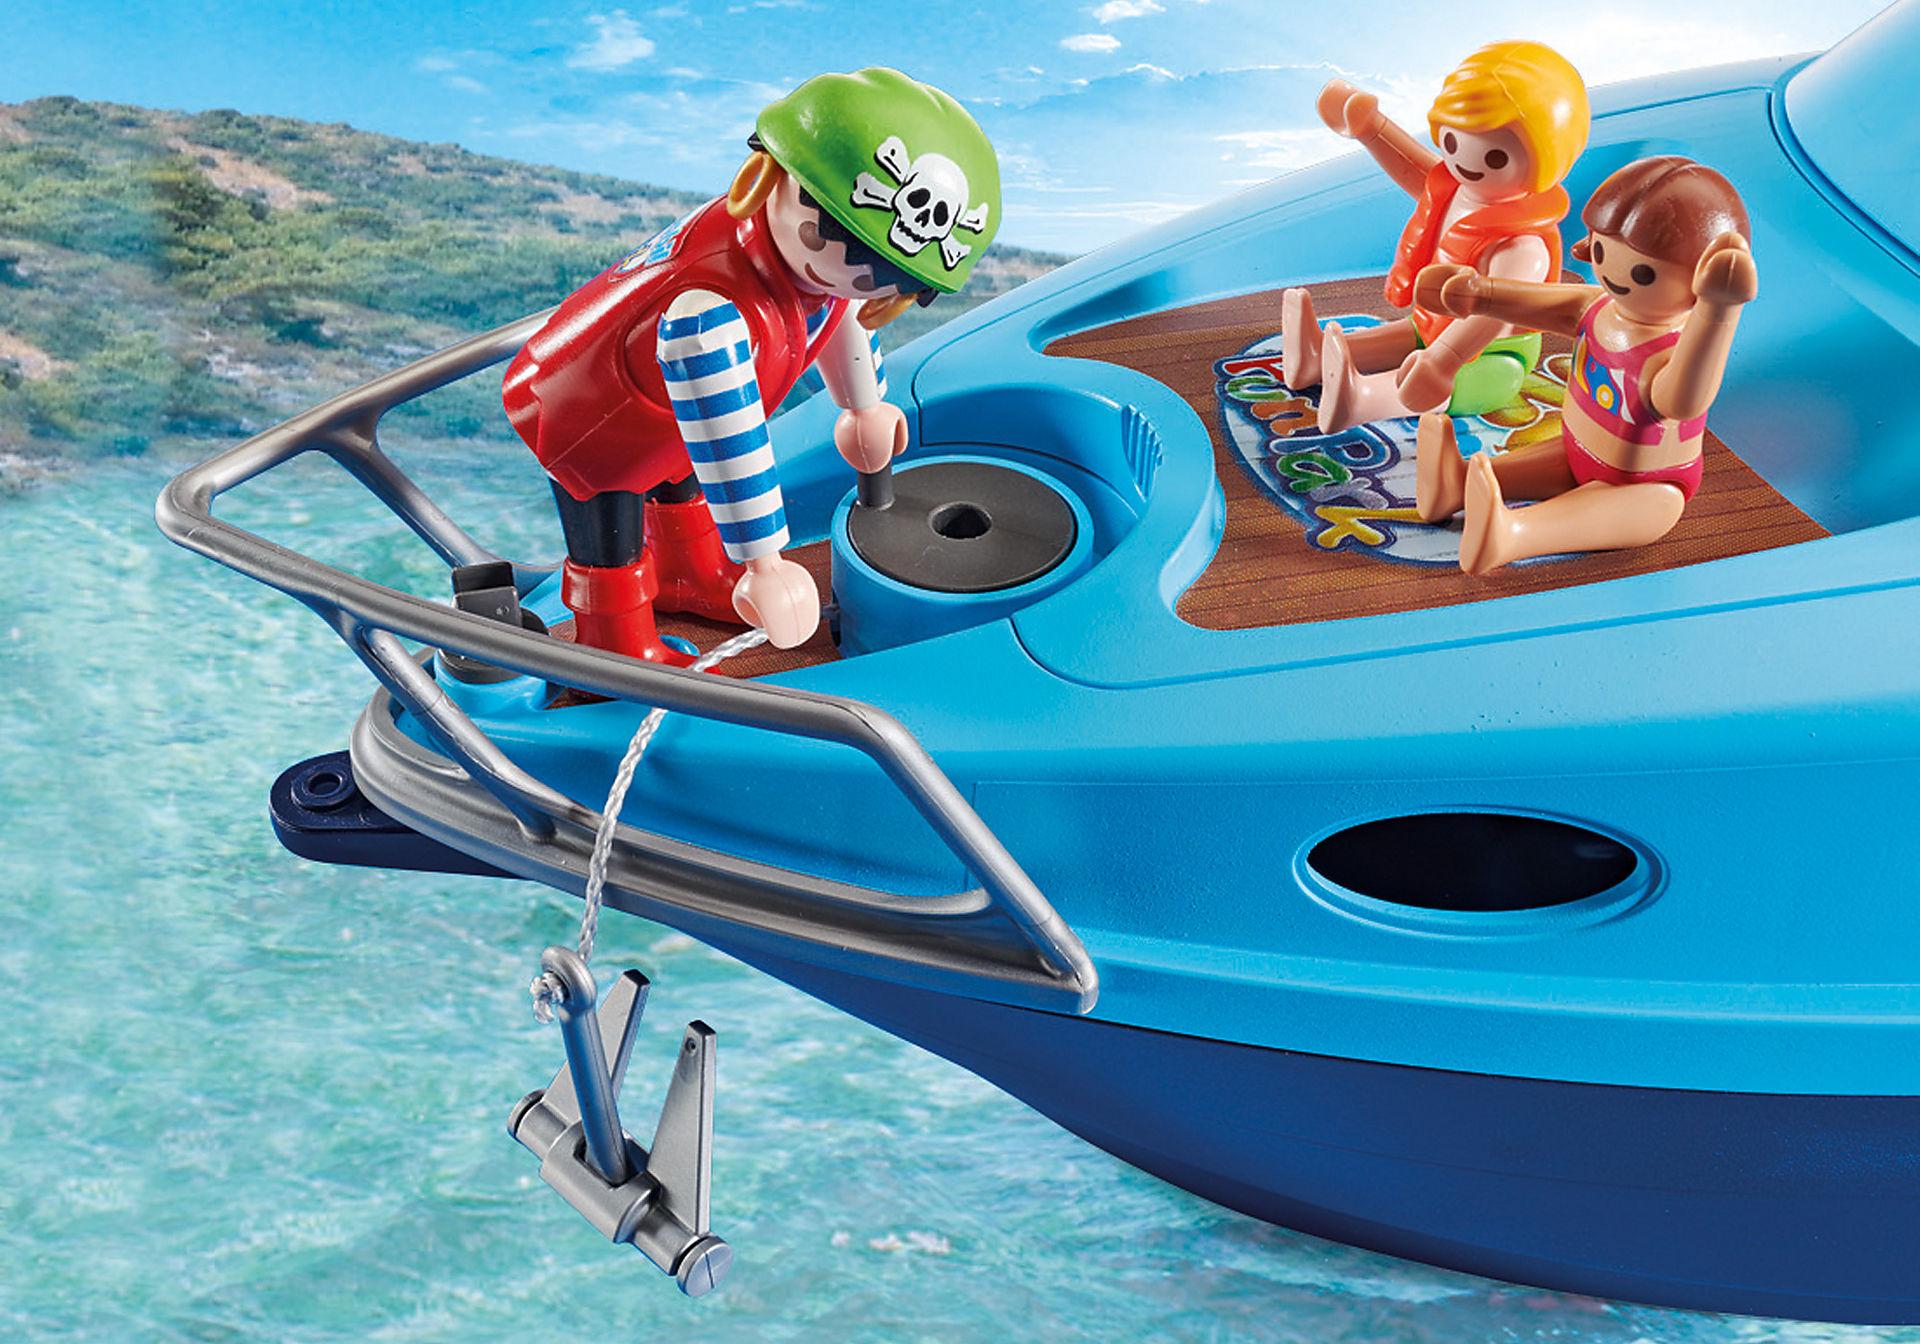 70630 PLAYMOBIL-FunPark Yacht e moto d'acqua zoom image5